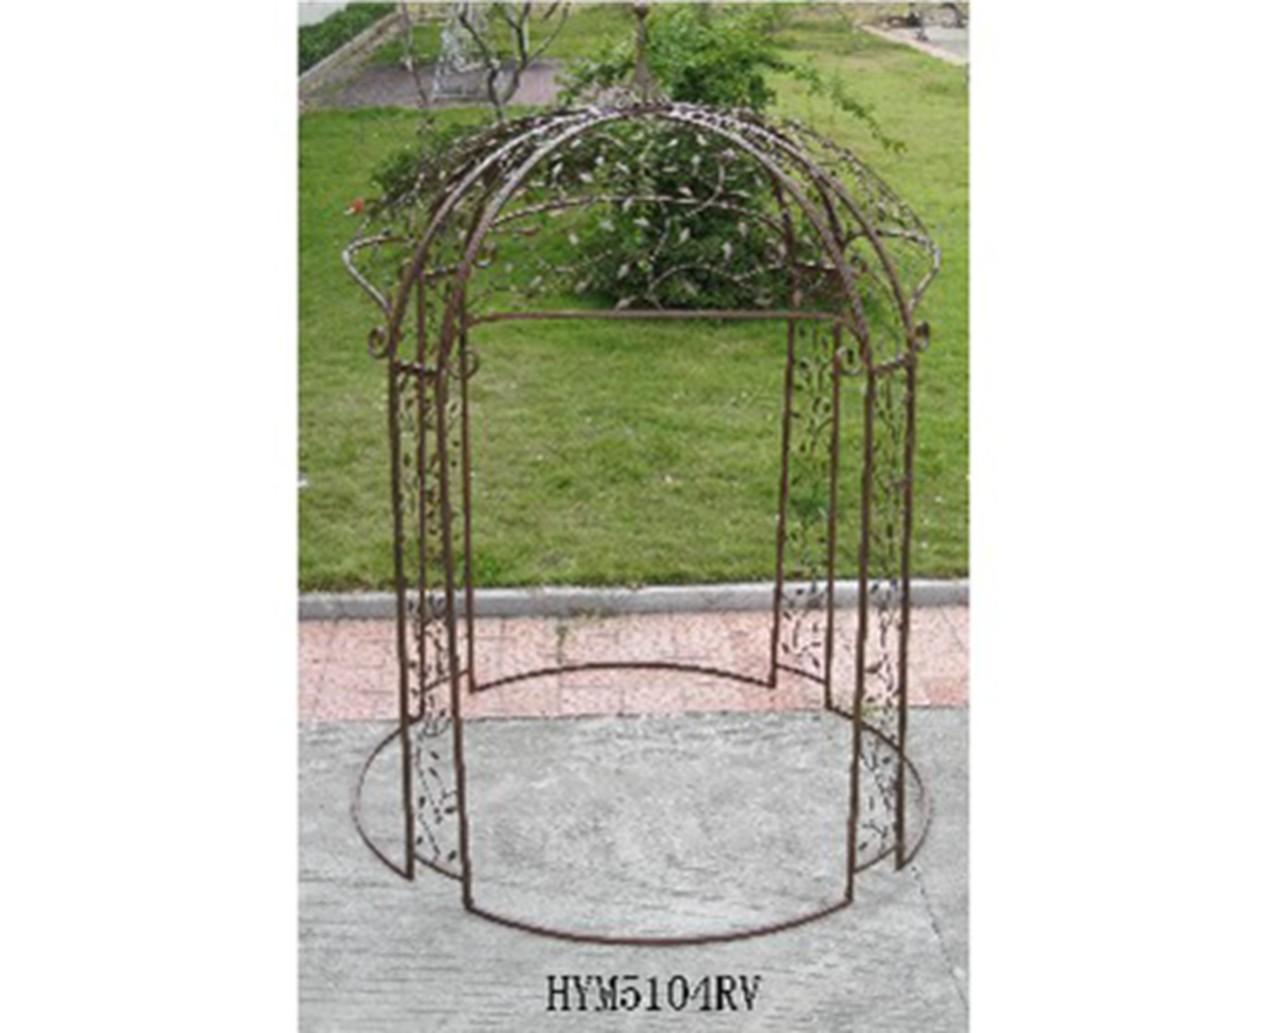 Kiosque en bois pour jardin - Leroy merlin kiosque de jardin ...